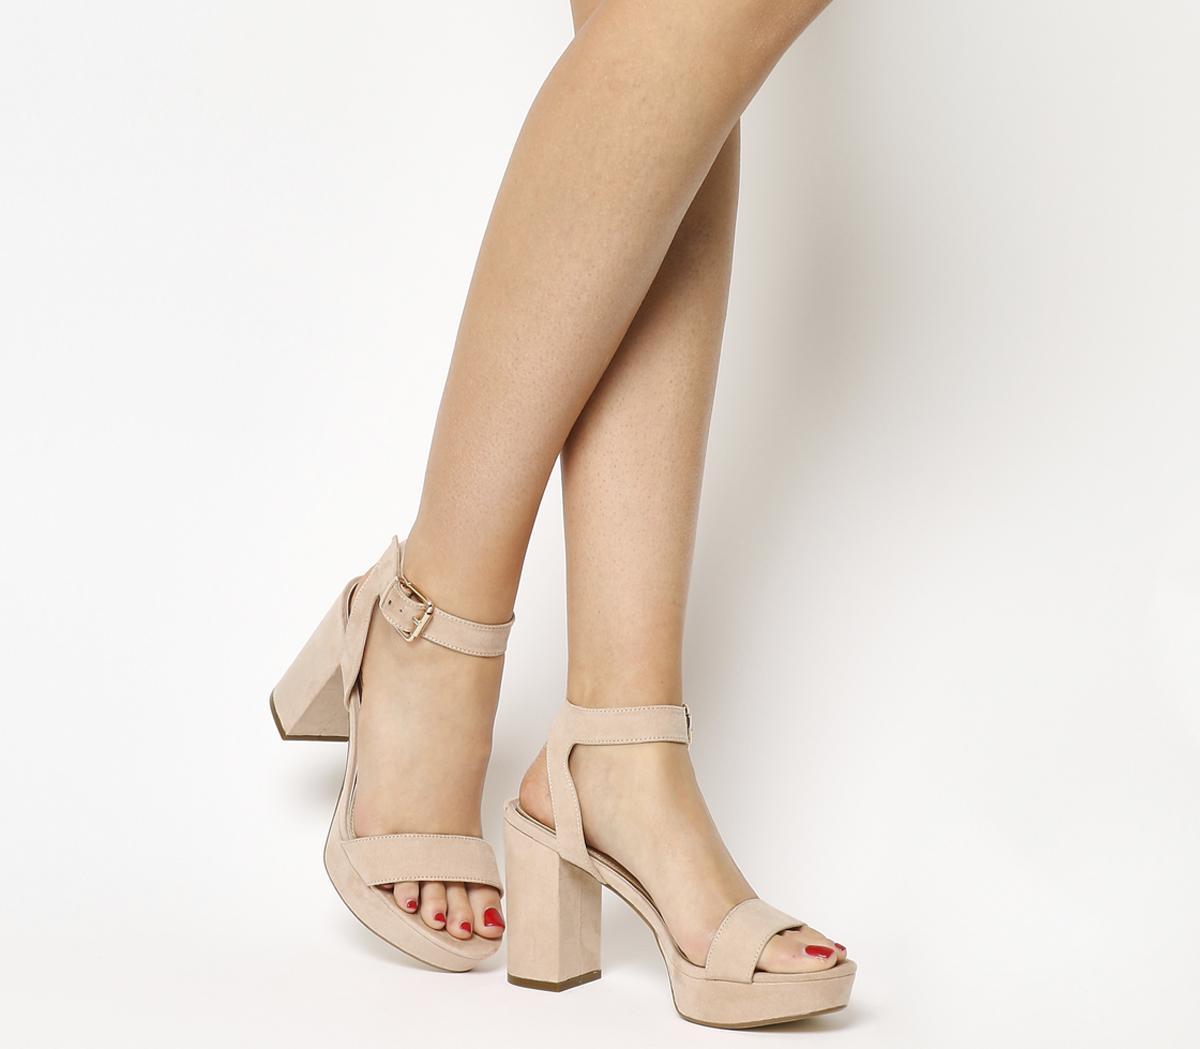 Office Mossy Platform Sandals Nude